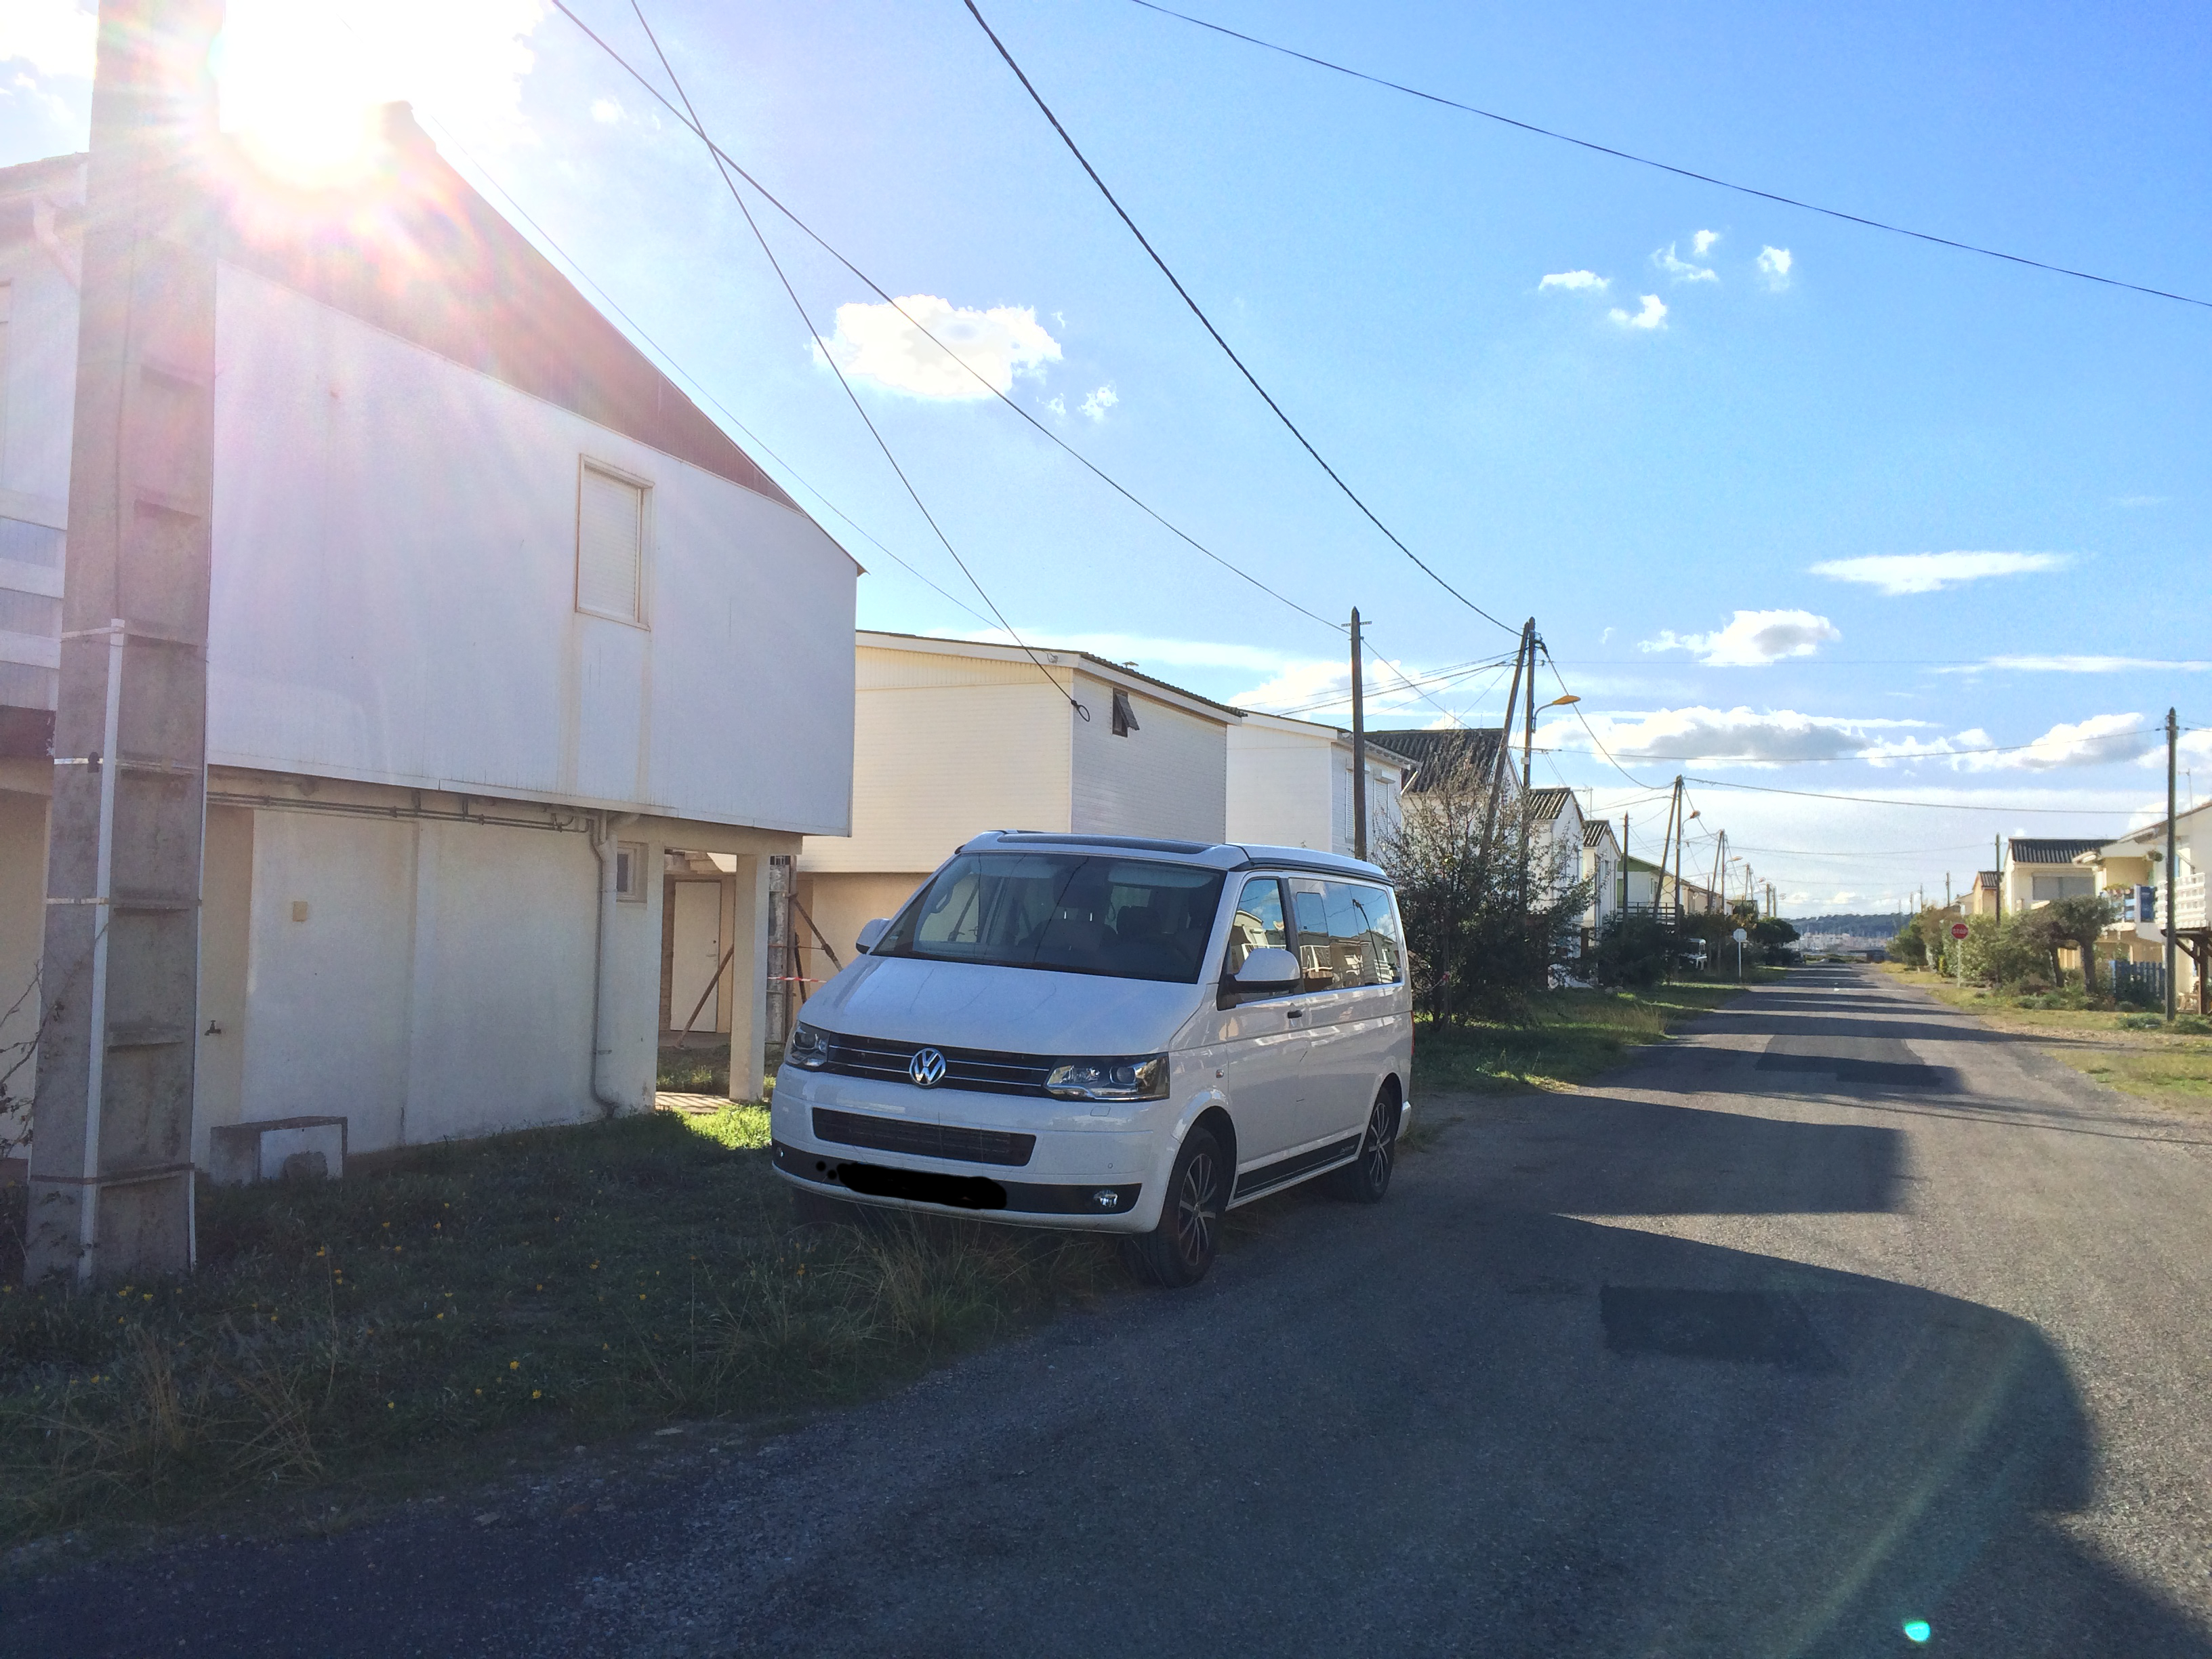 VW T5 California Edition Camping Frankreich November - Gruissan Plage Mittelmeer Küste Holzhäuser